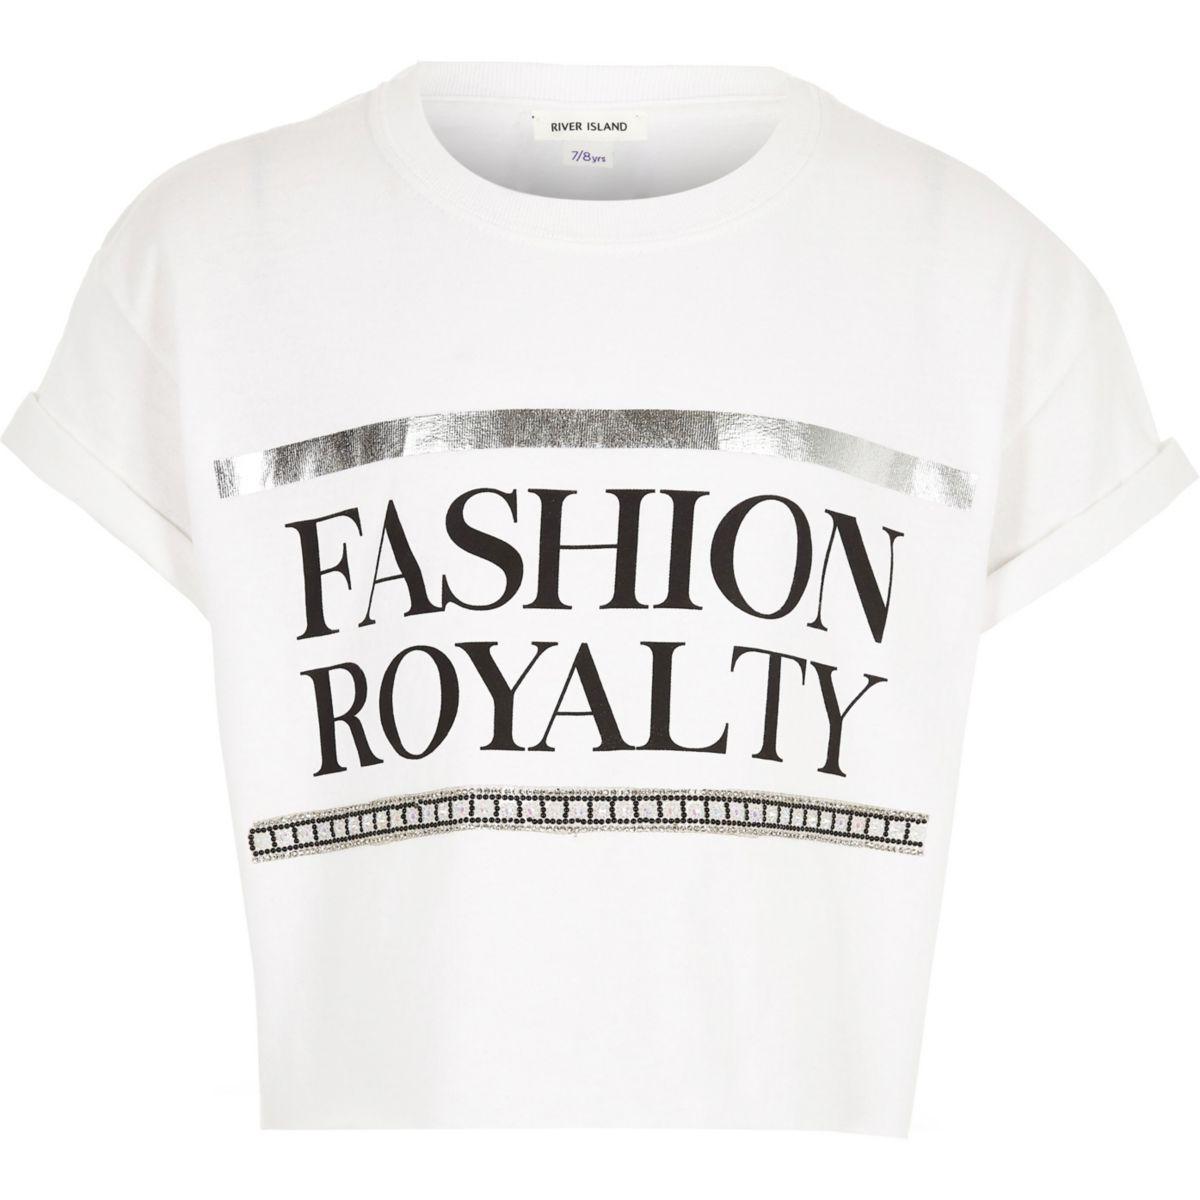 T-shirt « fashion royalty » blanc coupe courte pour fille